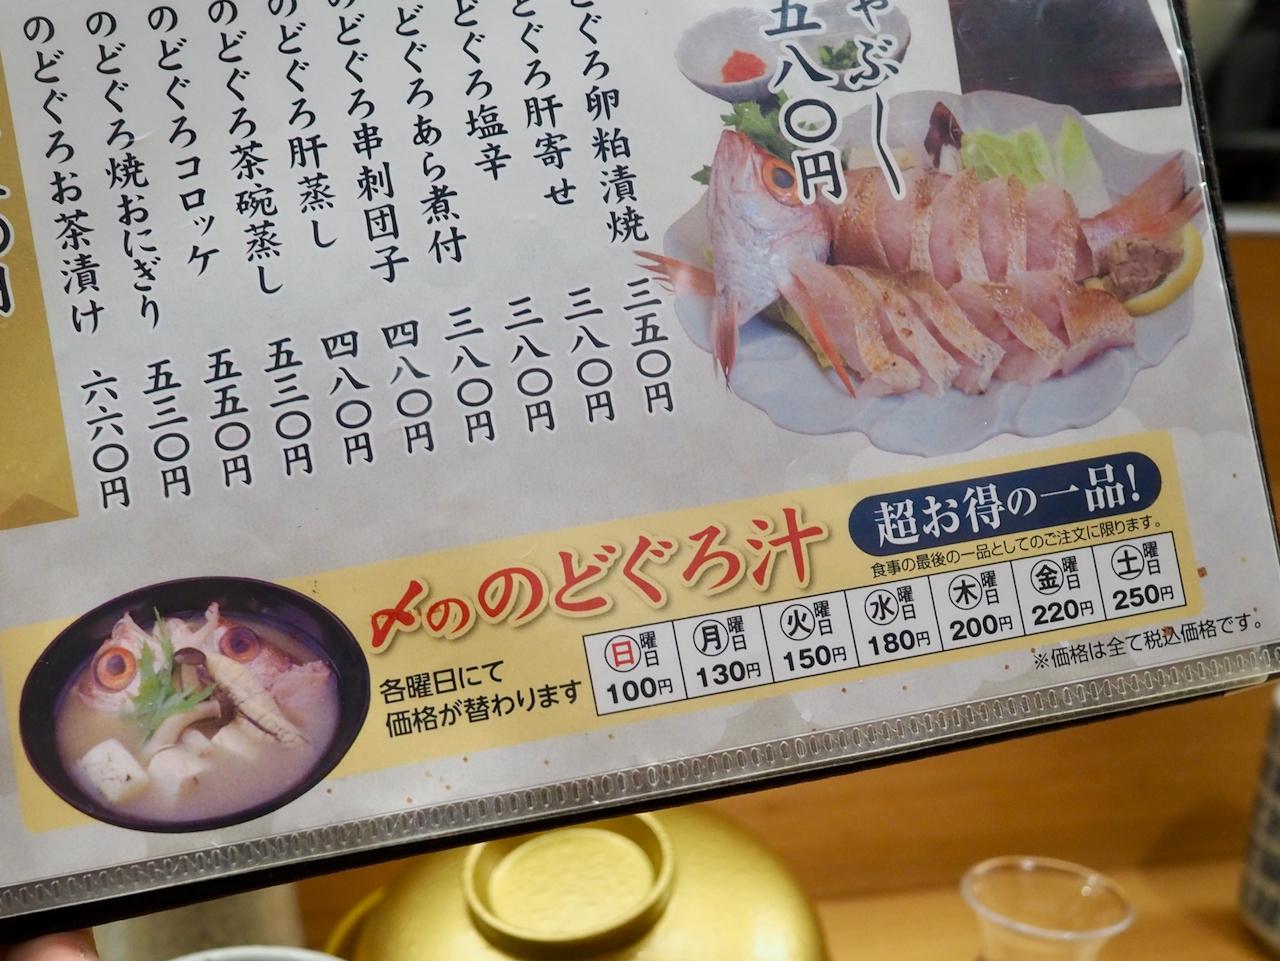 Nodokuro_2104-119.jpeg